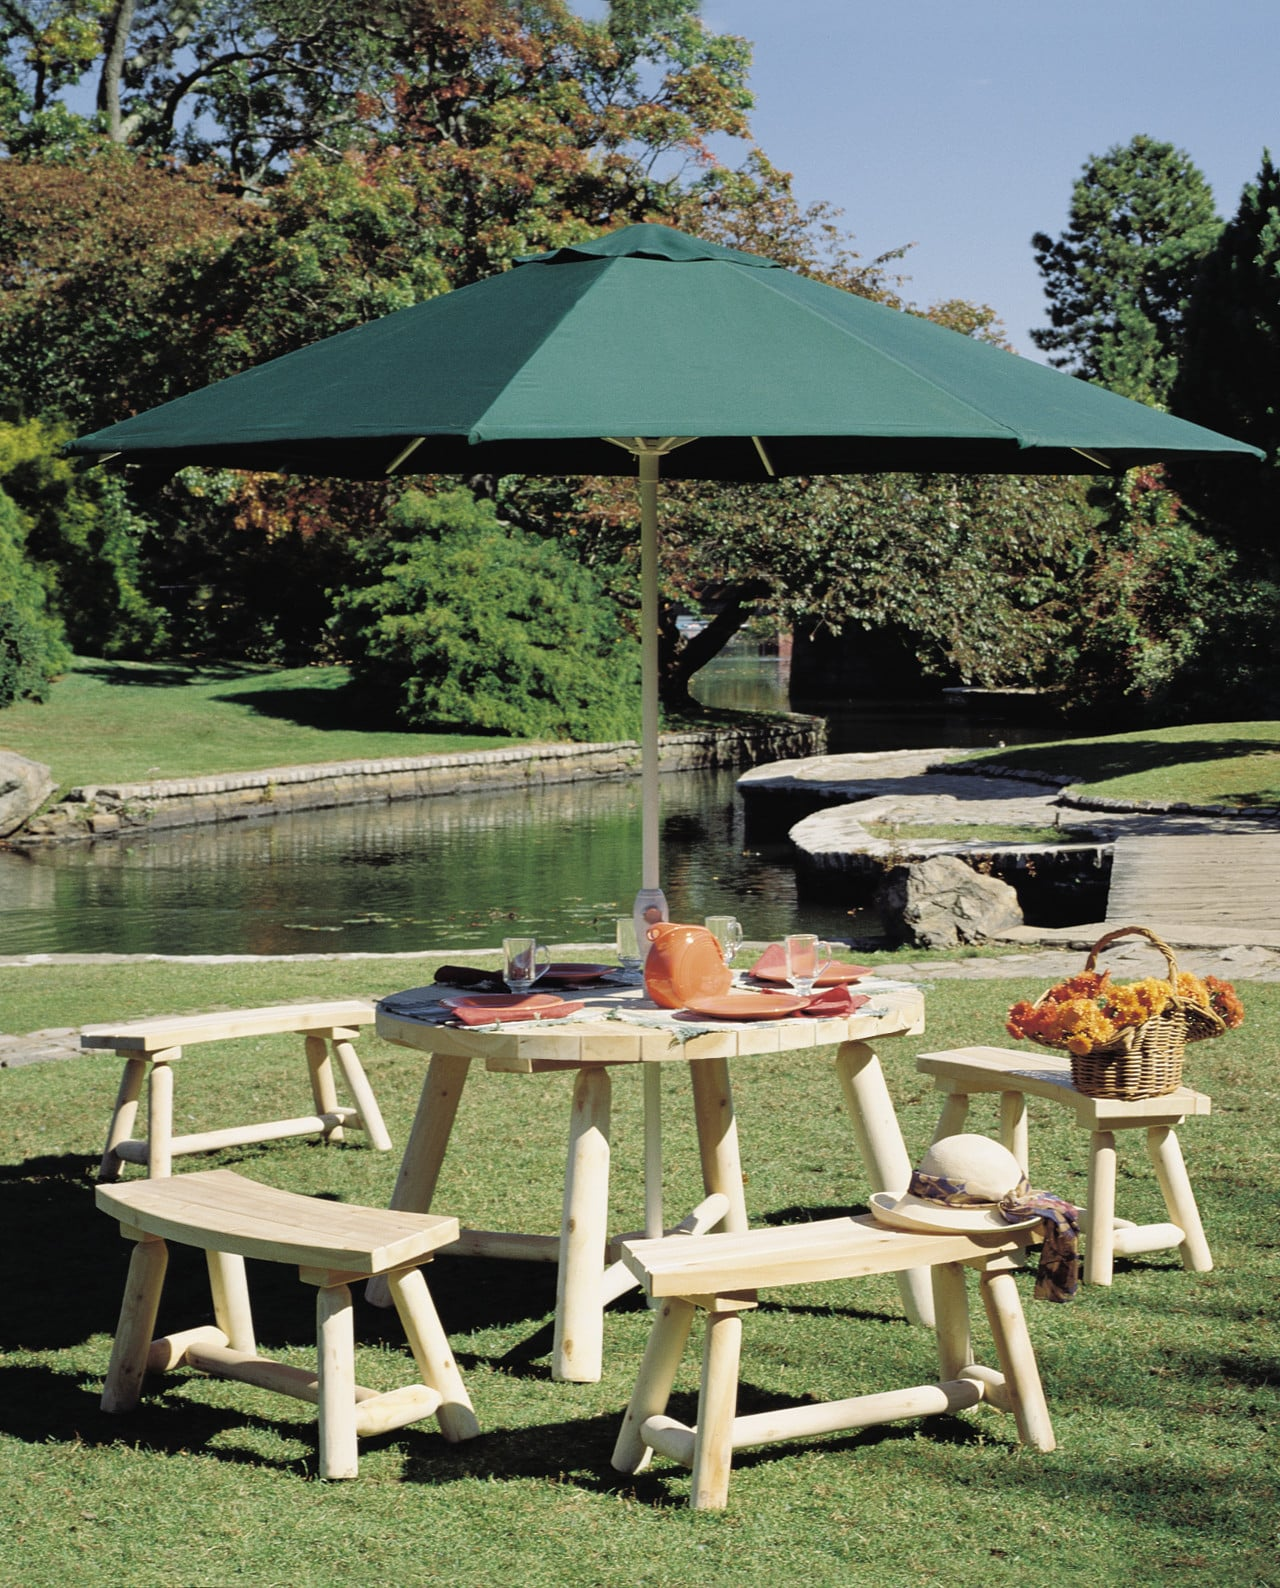 Table de Jardin Parasol Ronde en bois